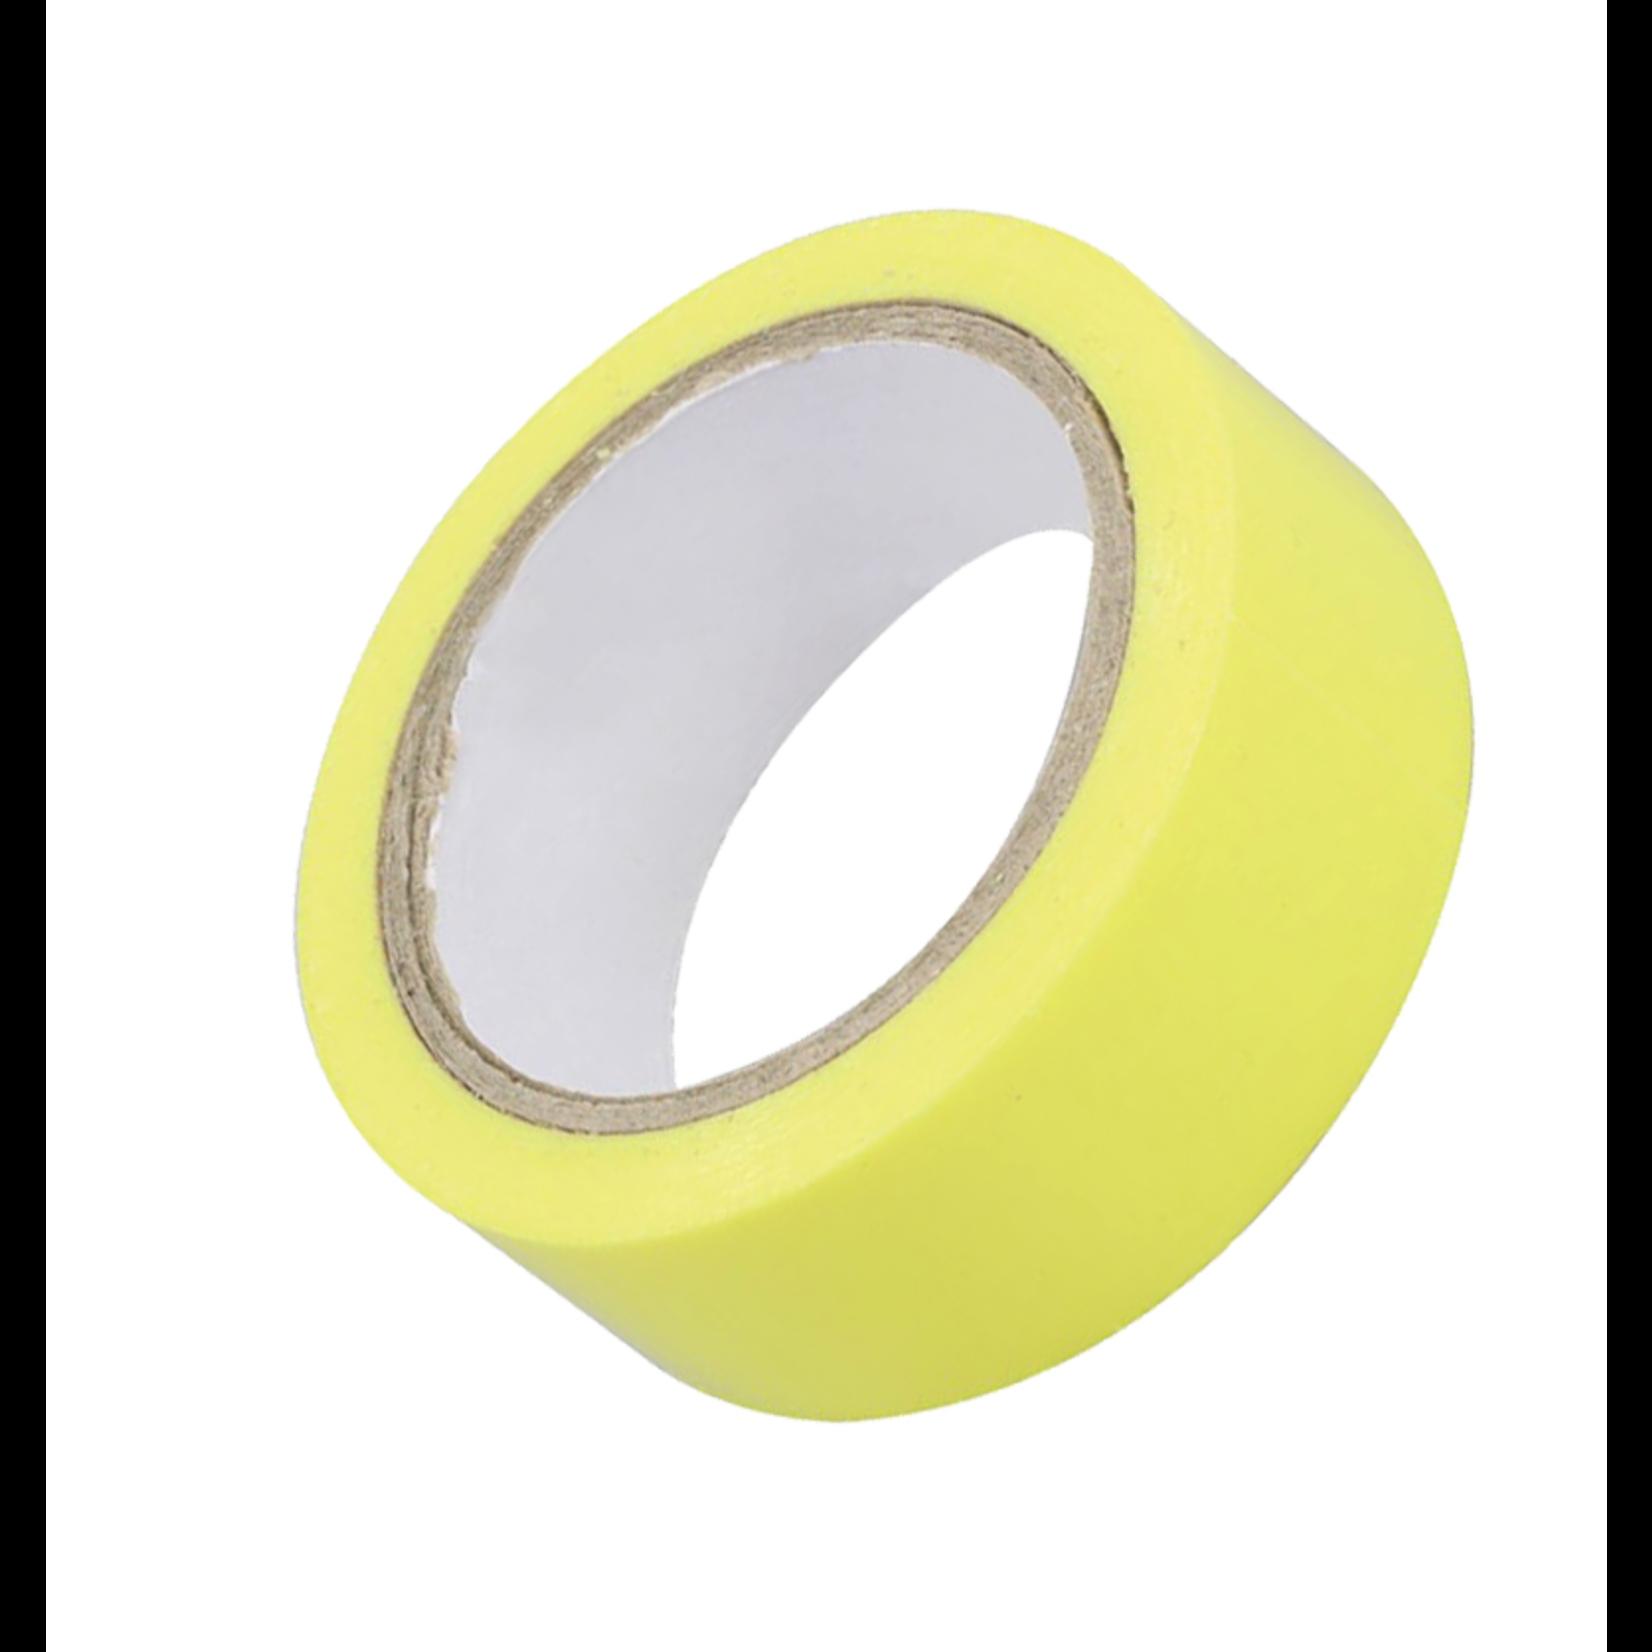 SERFAS Tubeless Rim Tape 25mm (SERFAS)